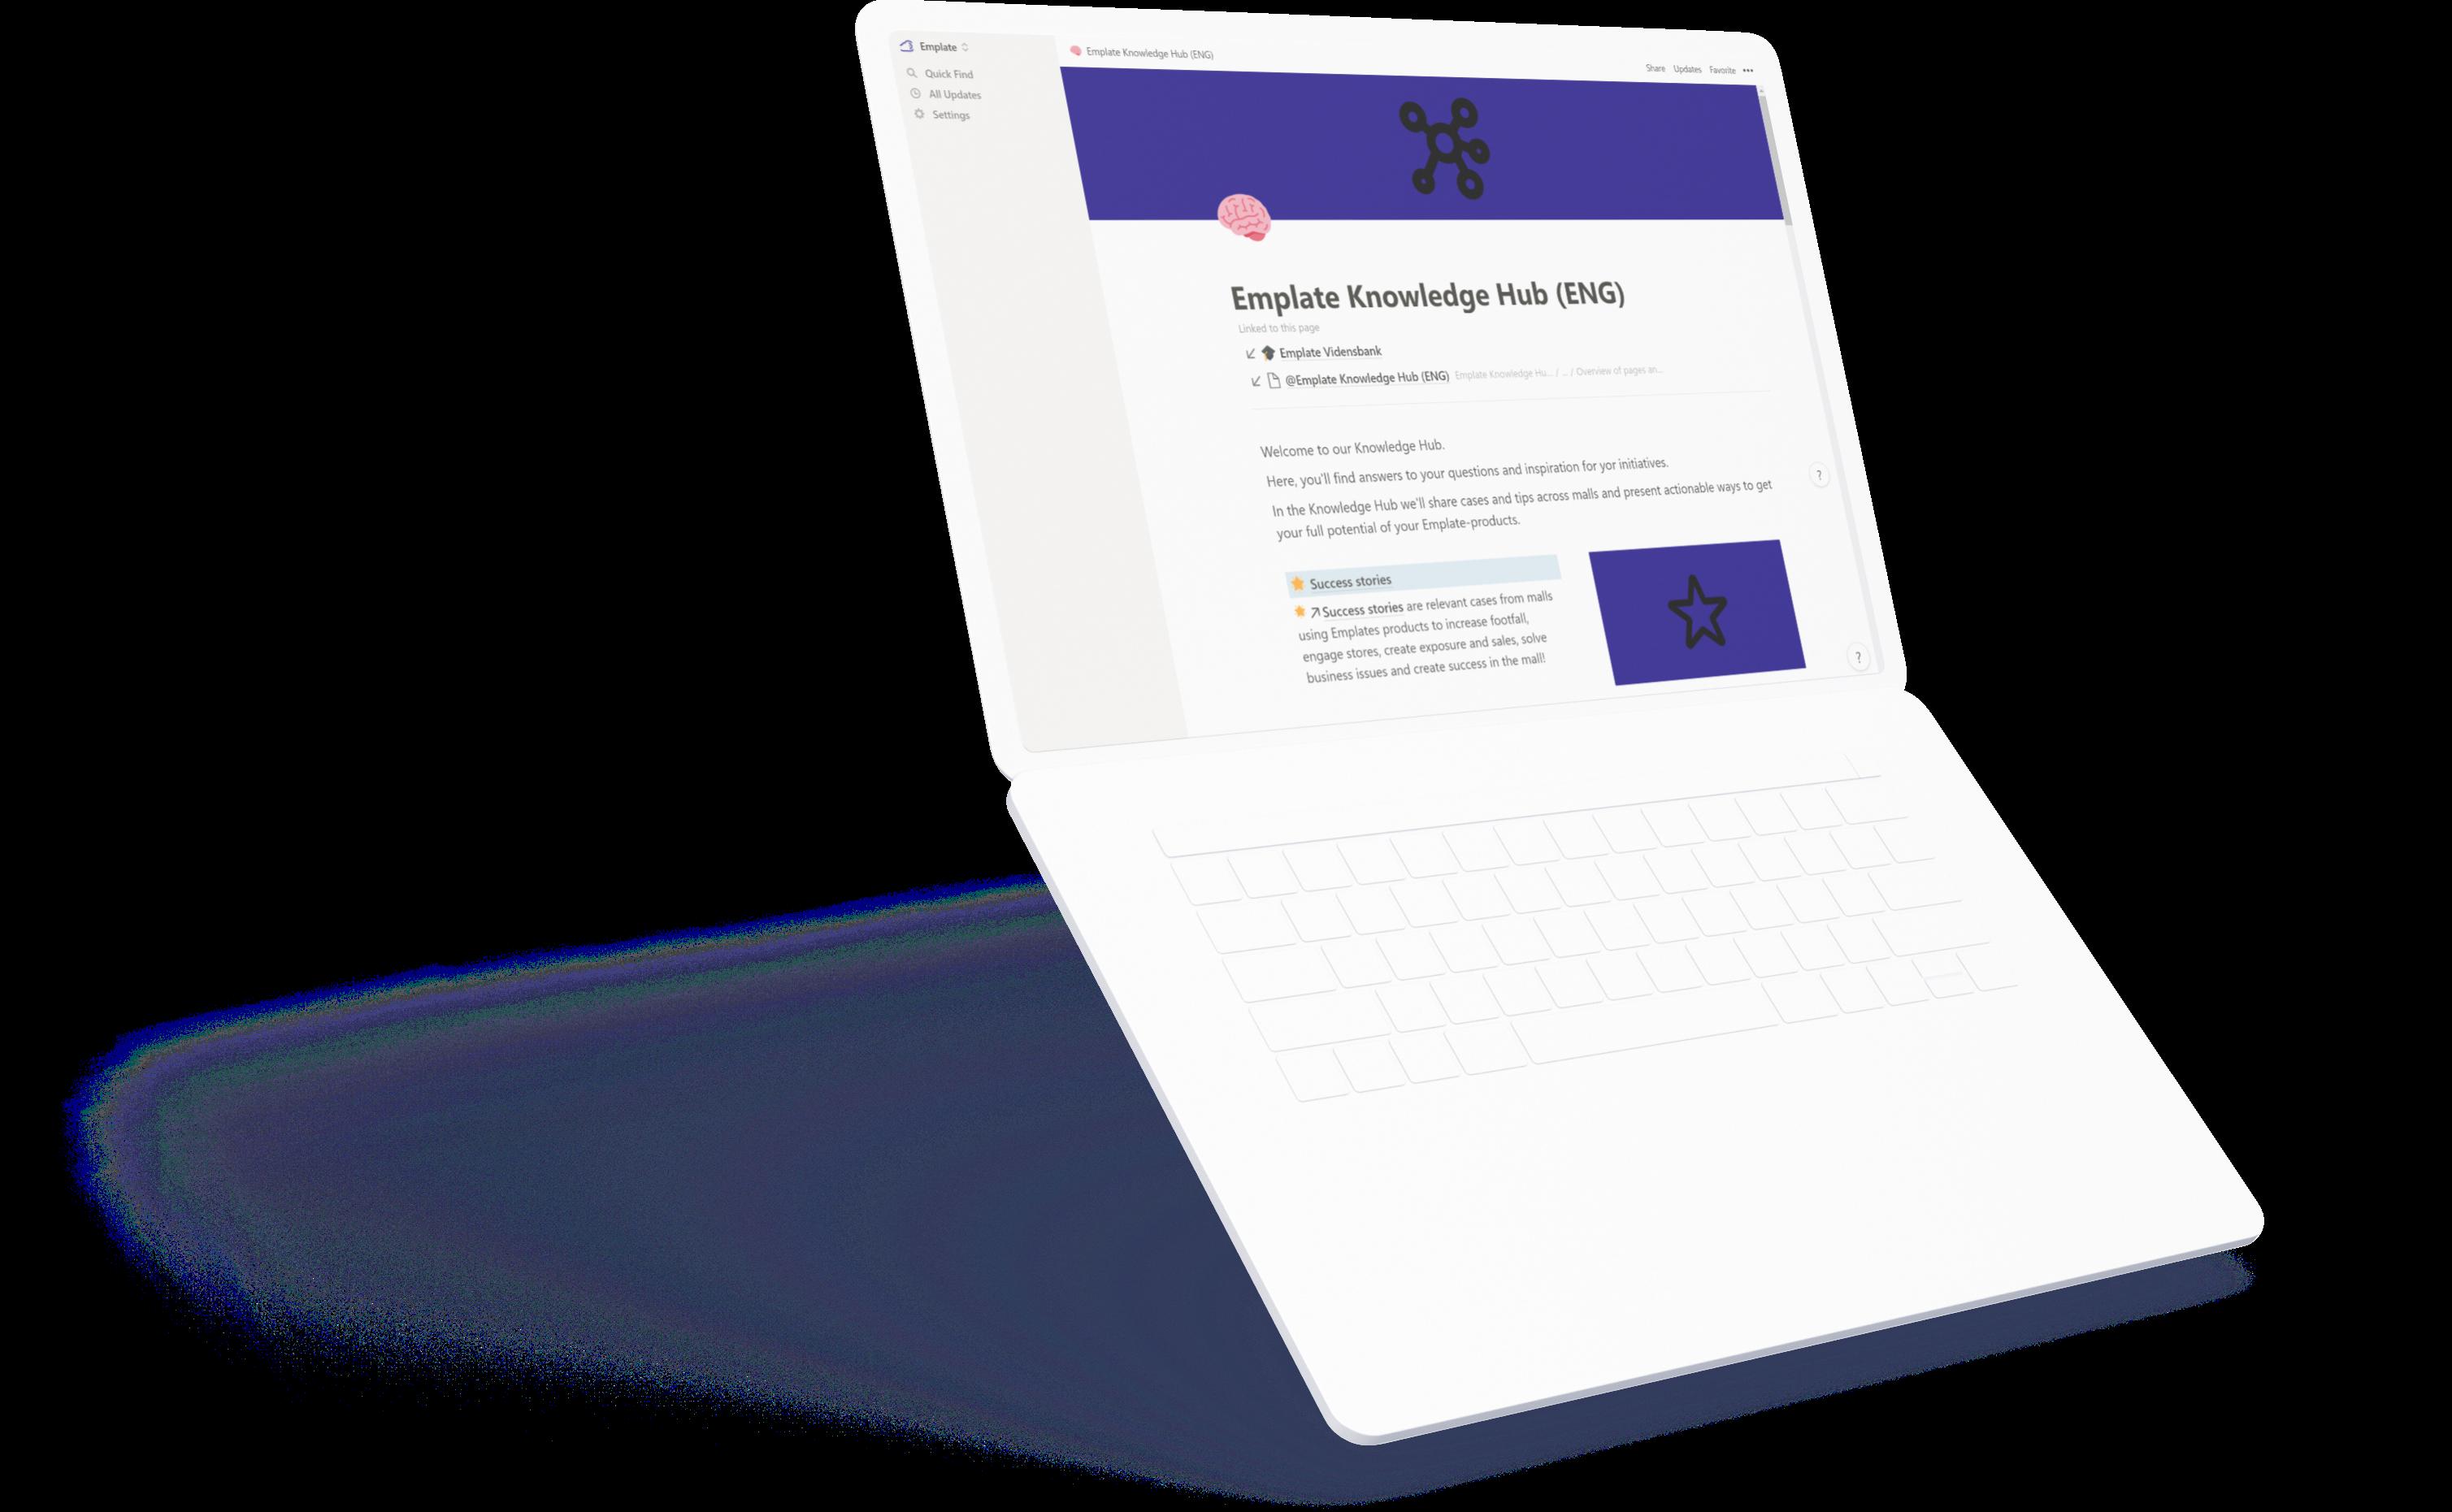 Emplate Knowledge Hub on laptop